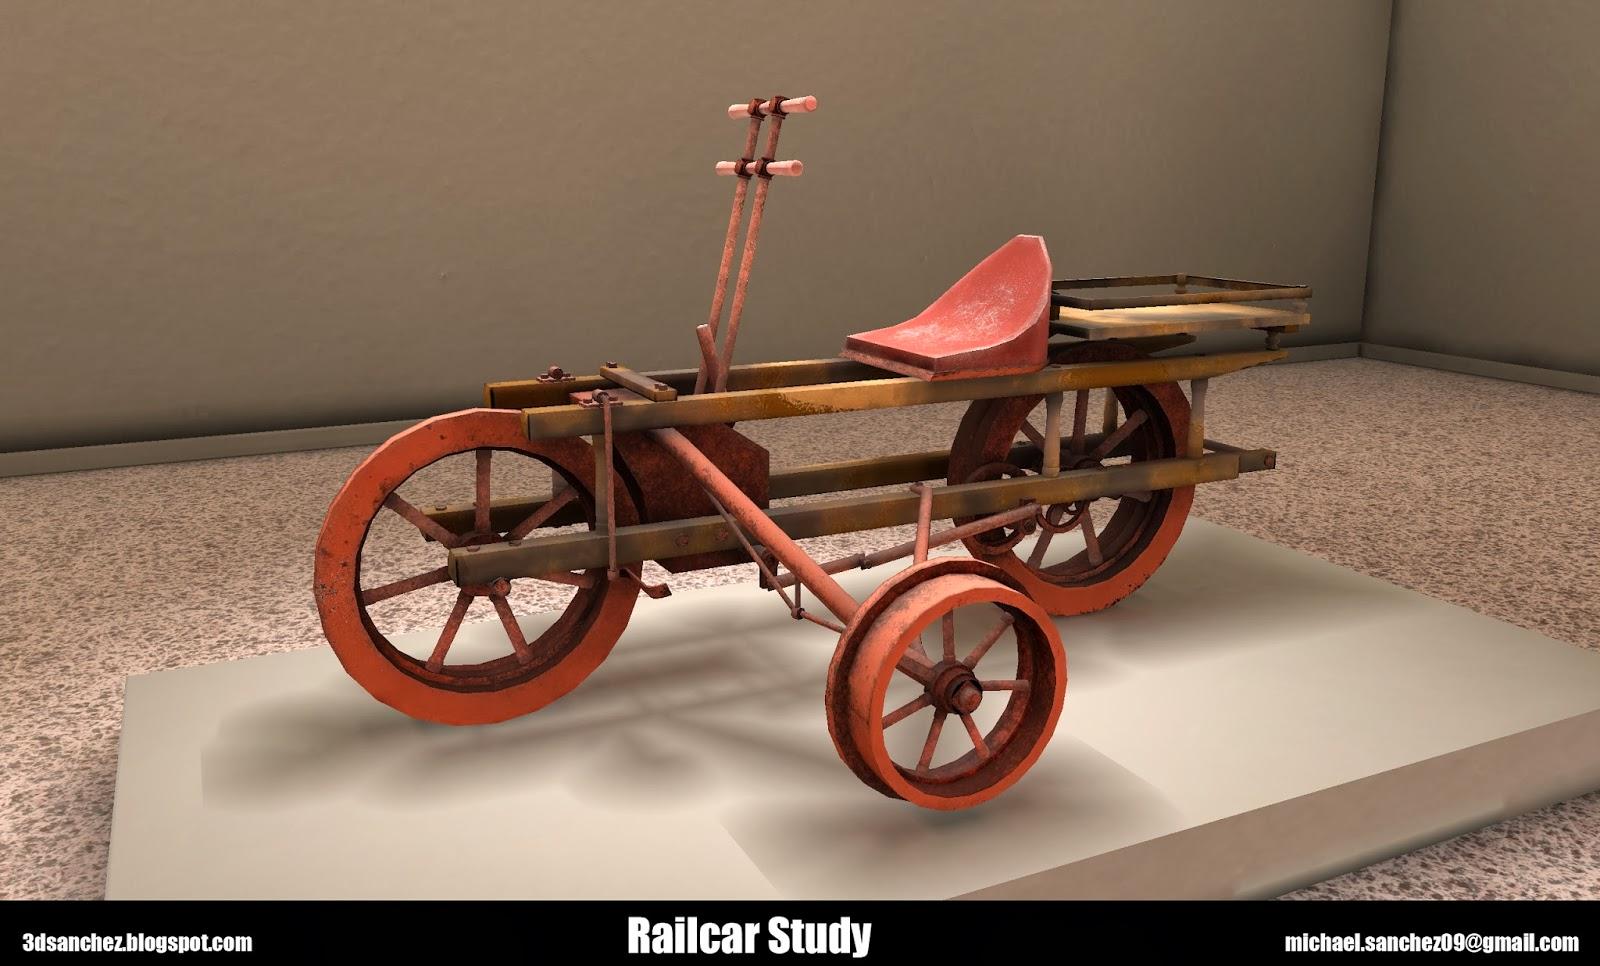 Railcar_blog_hirez1.jpg